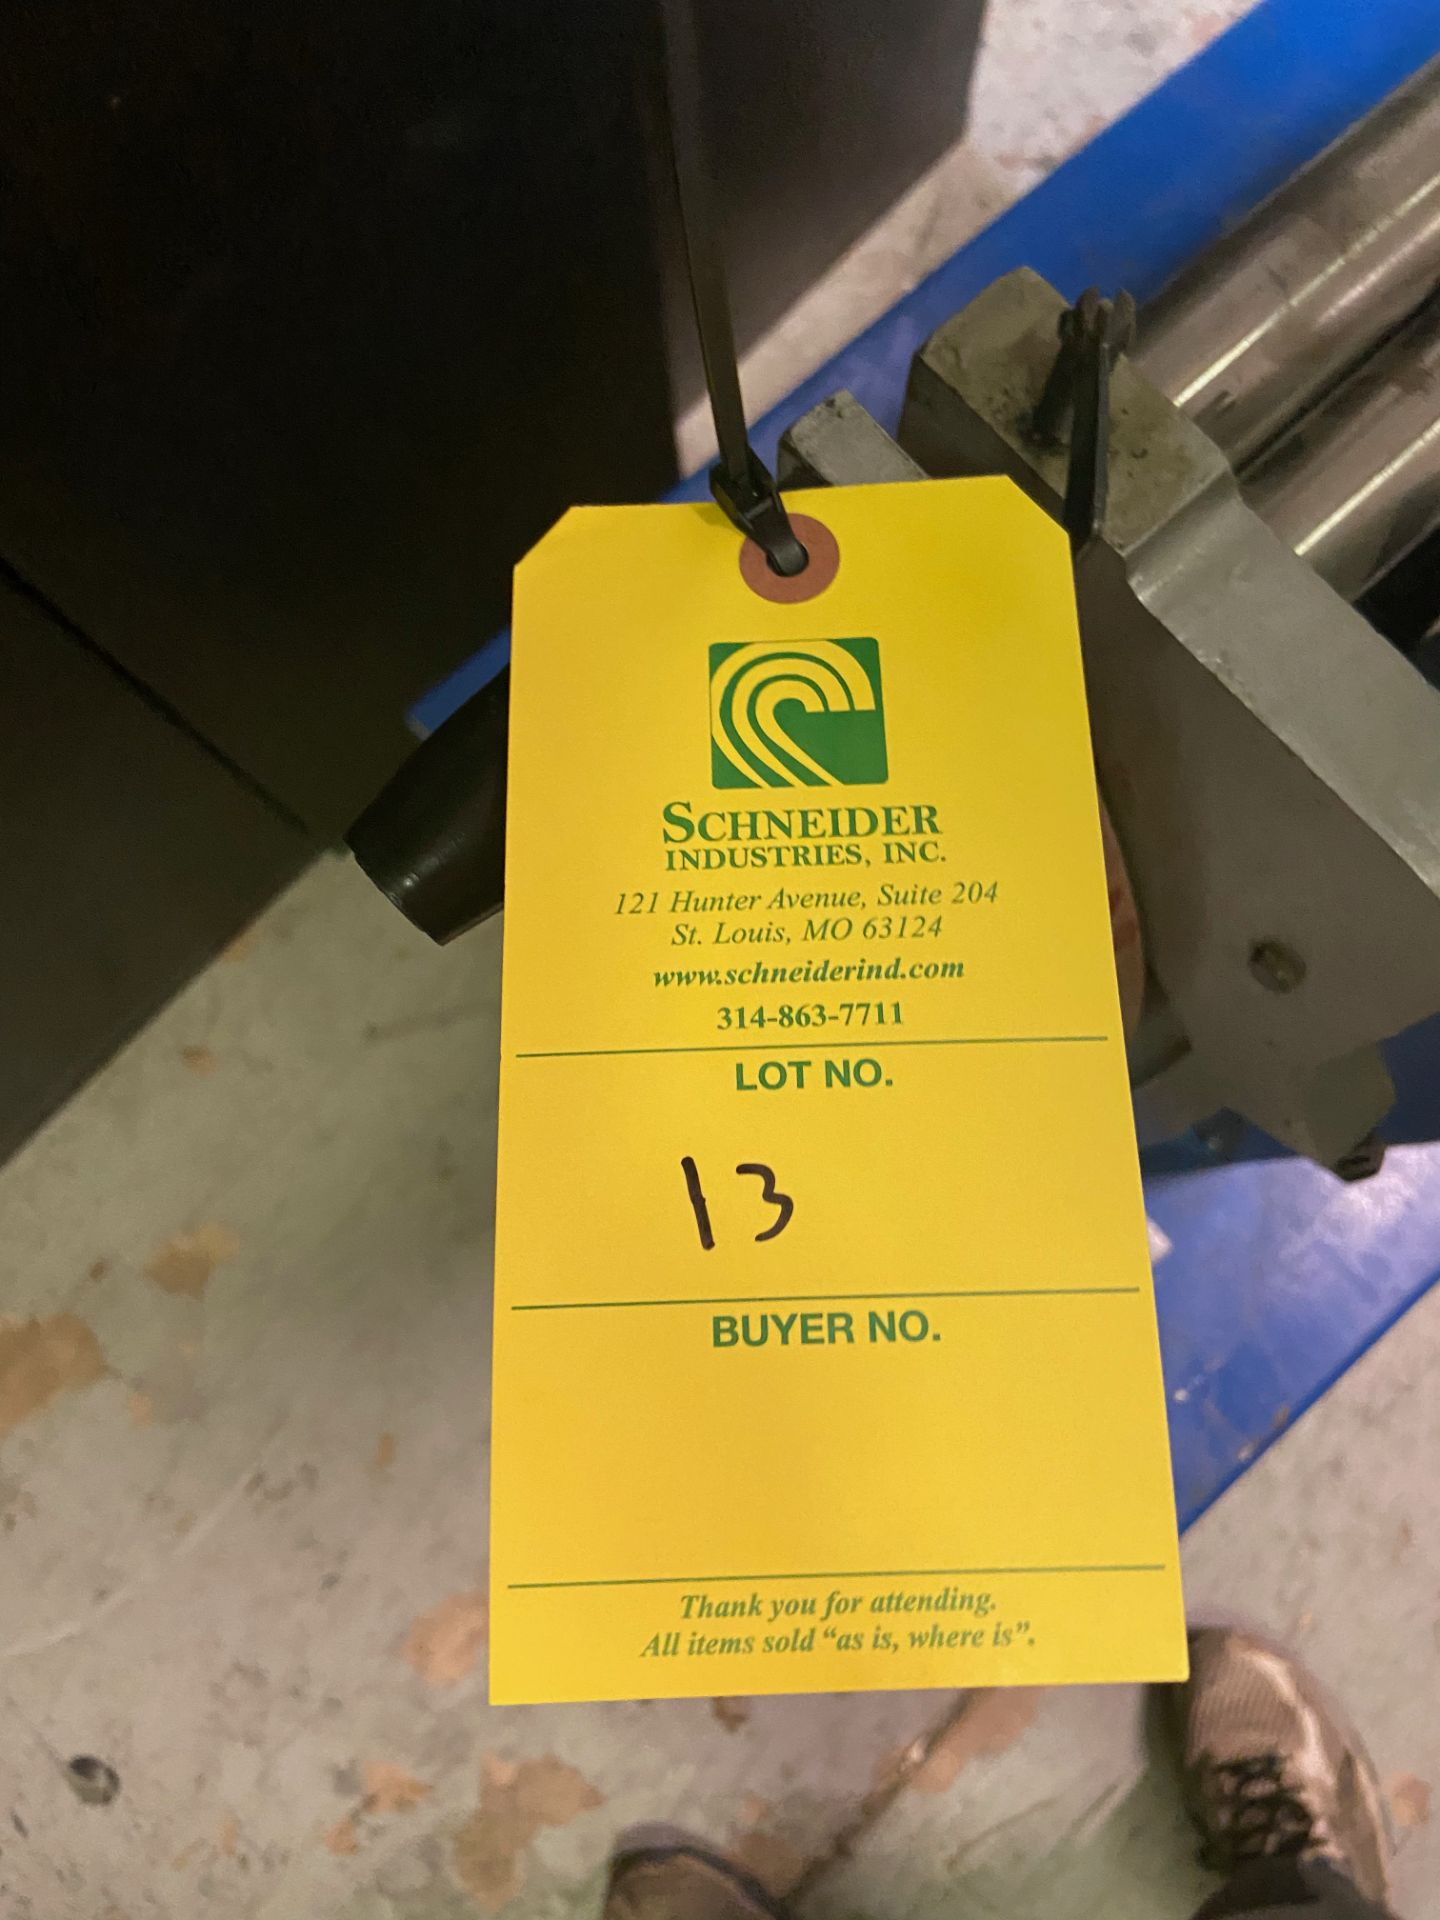 Durham Sheet Metal Brake/Bender, Model# WSR-4, Loading/Removal Fee: $20 - Image 5 of 5